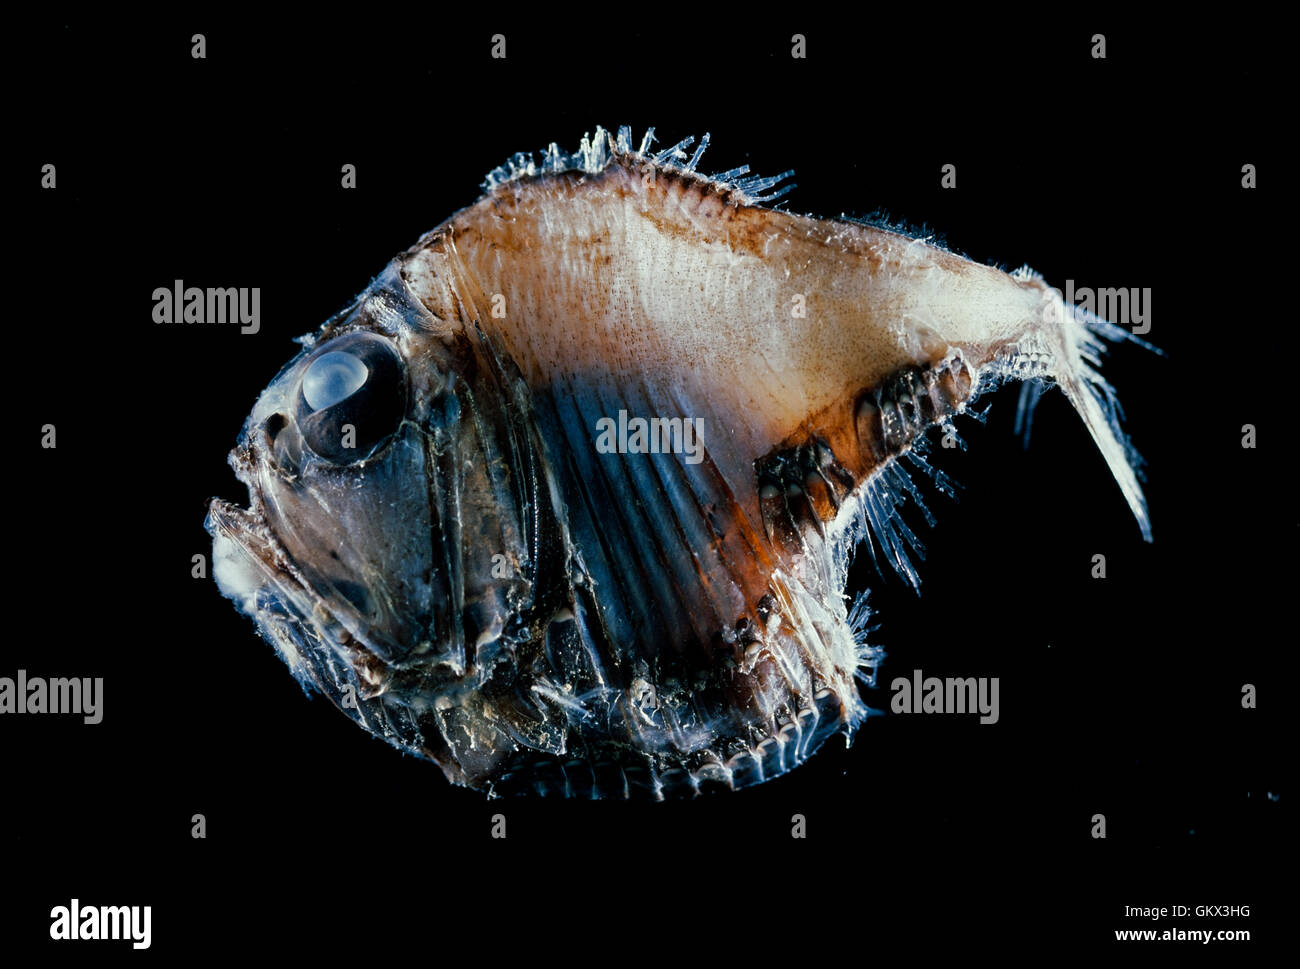 Lovely hatchetfish, Argyropelecus aculeatus. Portugal - Stock Image